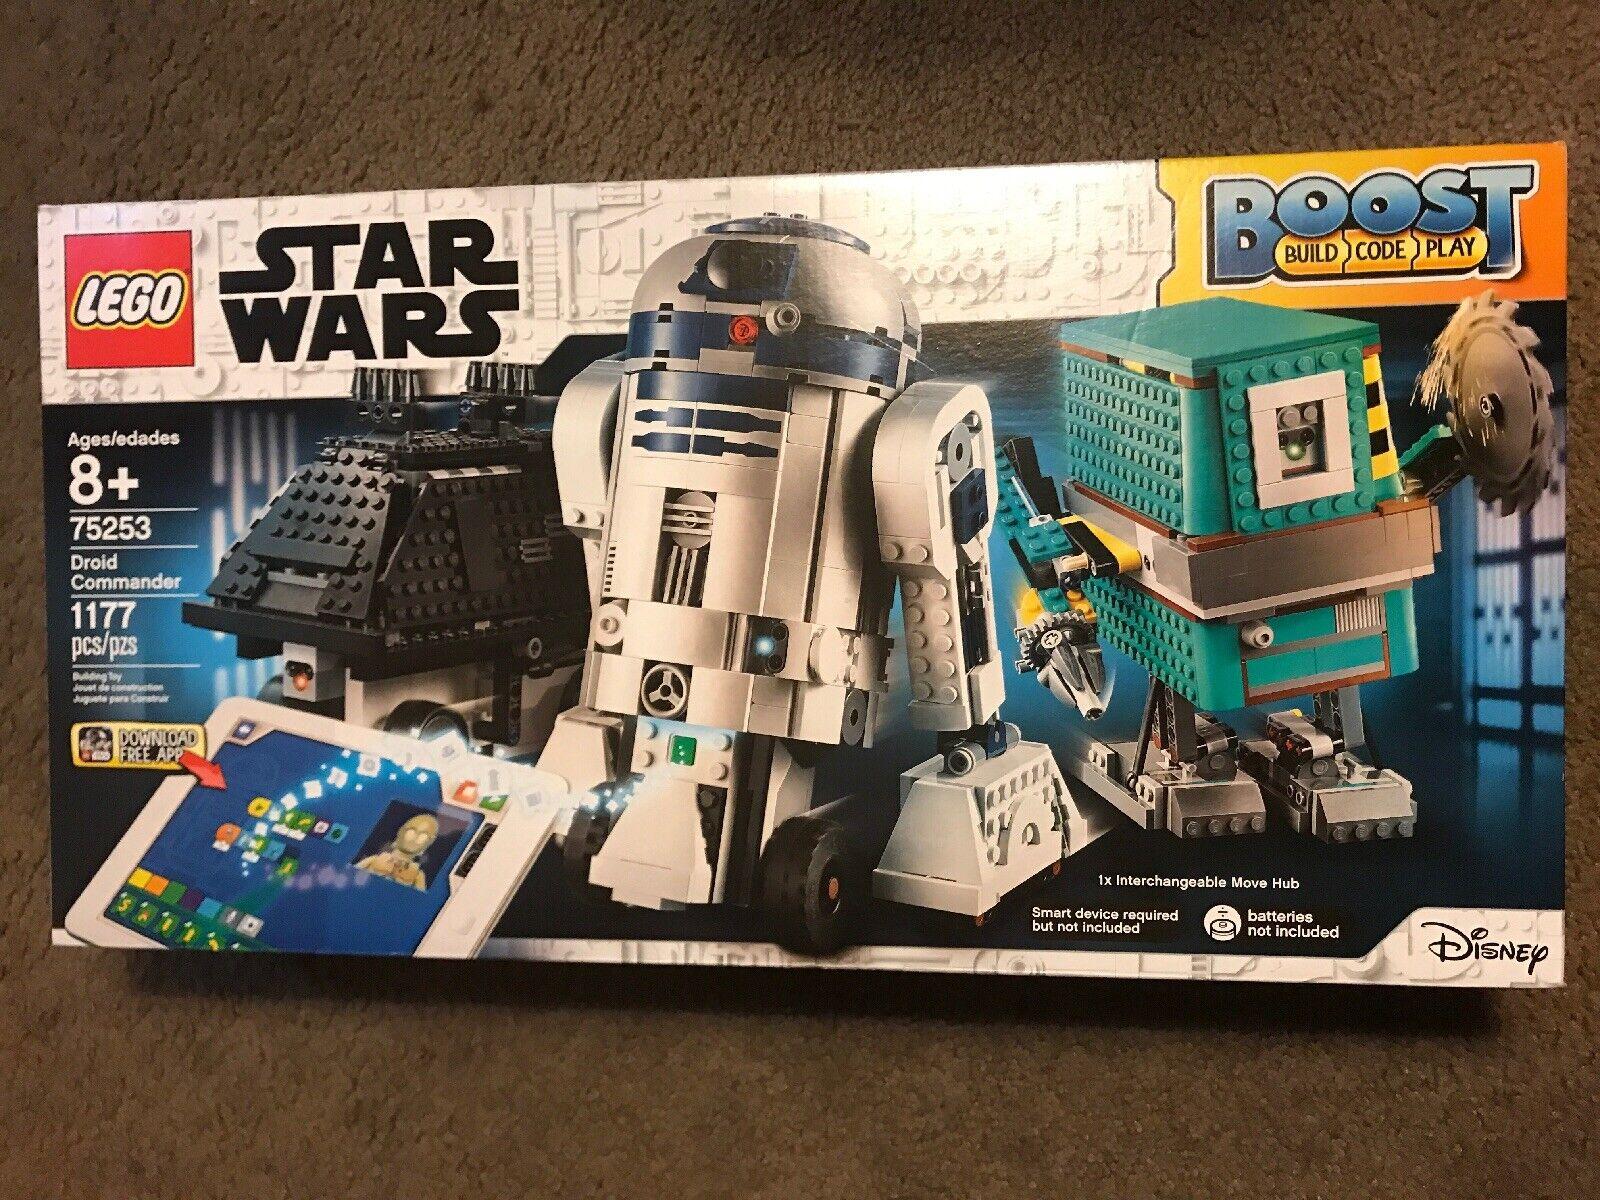 Lego estrella guerras 75253 Ultimate  Galaxy Boost Droid Comuomoder Interactive Robot Set  consegna gratuita